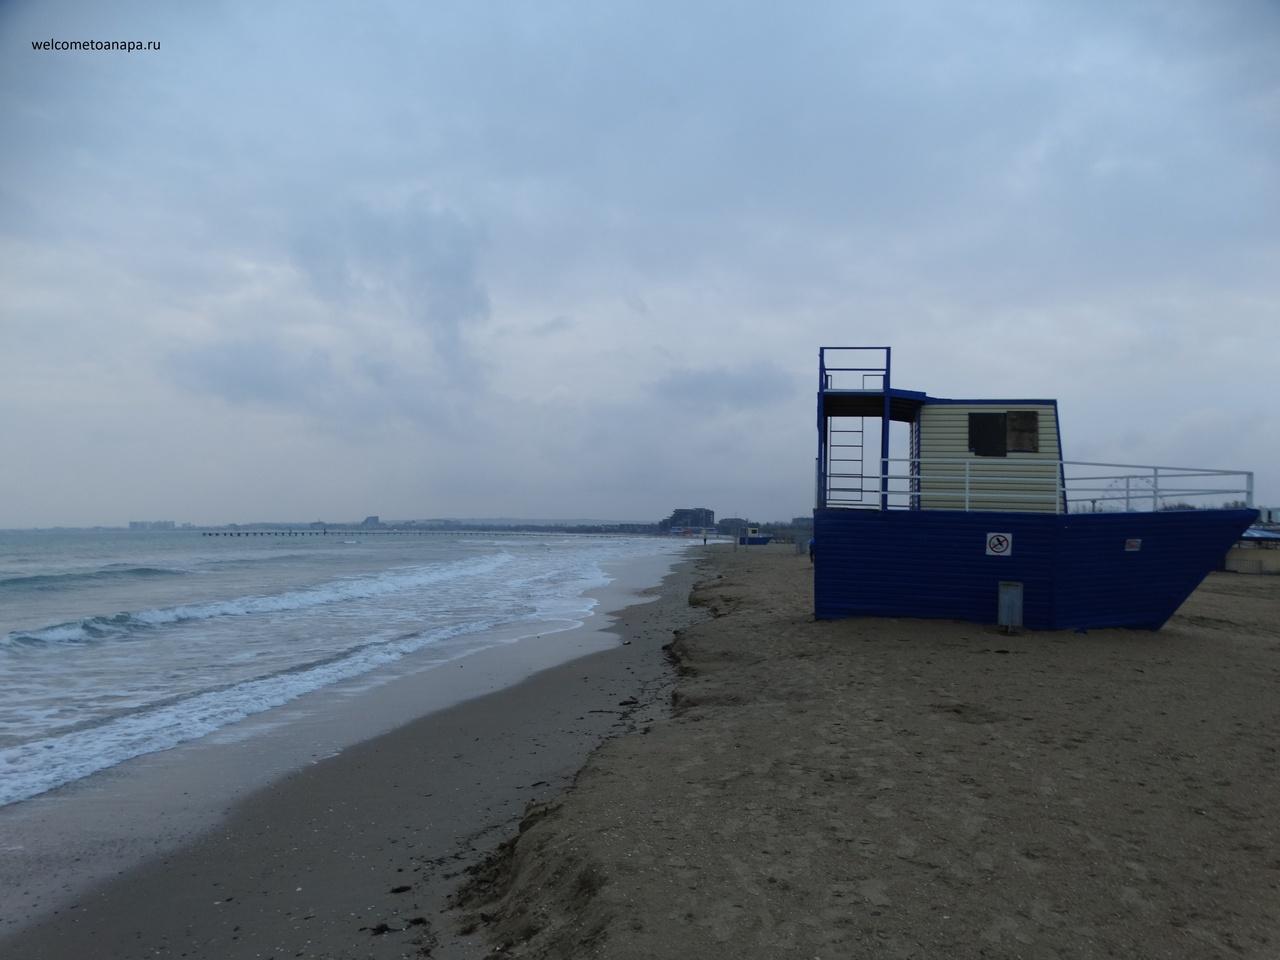 Анапа 2018 фото пляжей